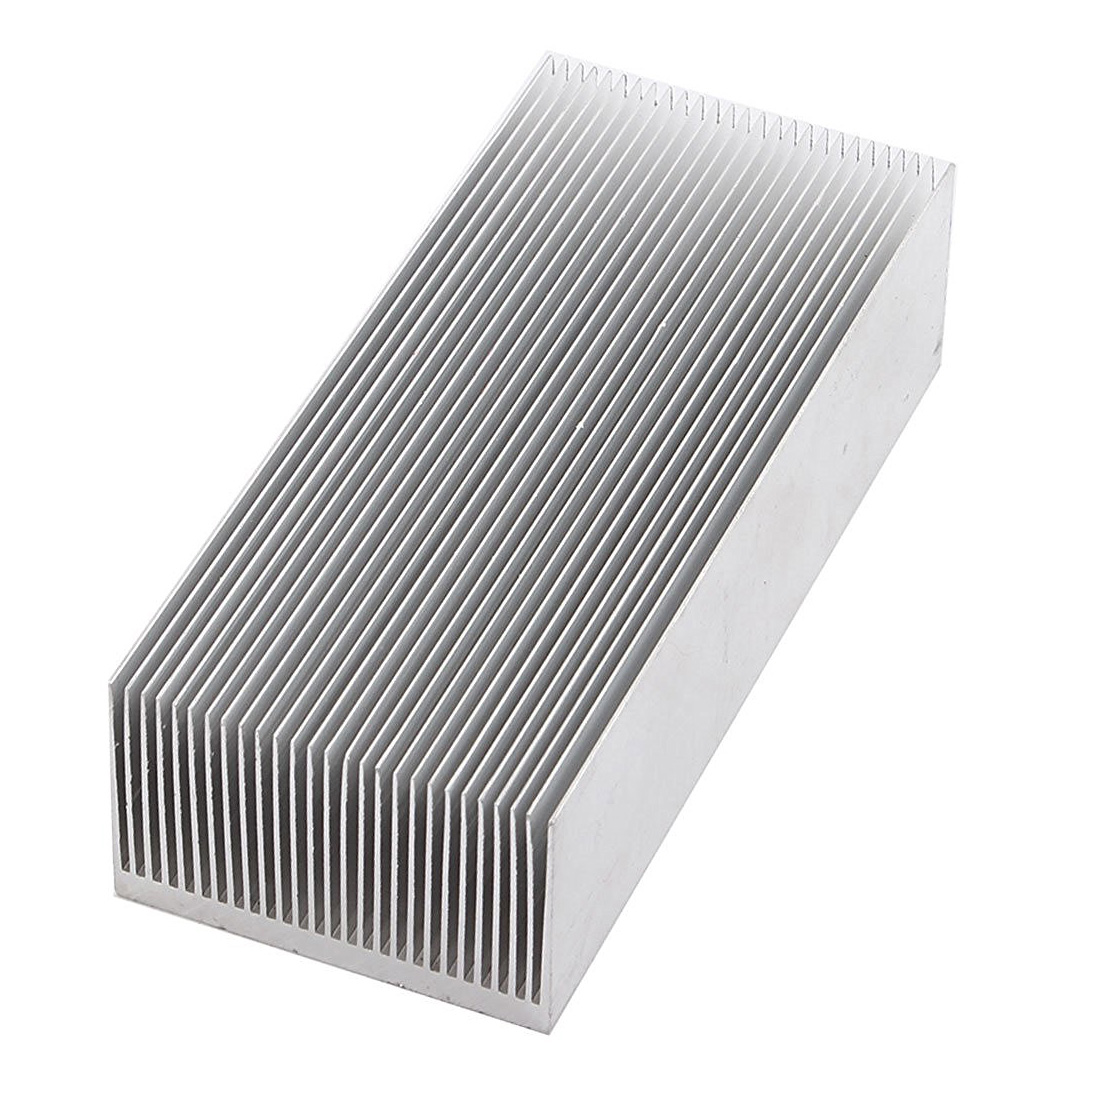 757.92руб. 10% СКИДКА|Алюминиевый теплоотвод 150x69x37 мм серебристый тон|heatsink cooling|aluminum heating radiators|radiator heatsink - AliExpress